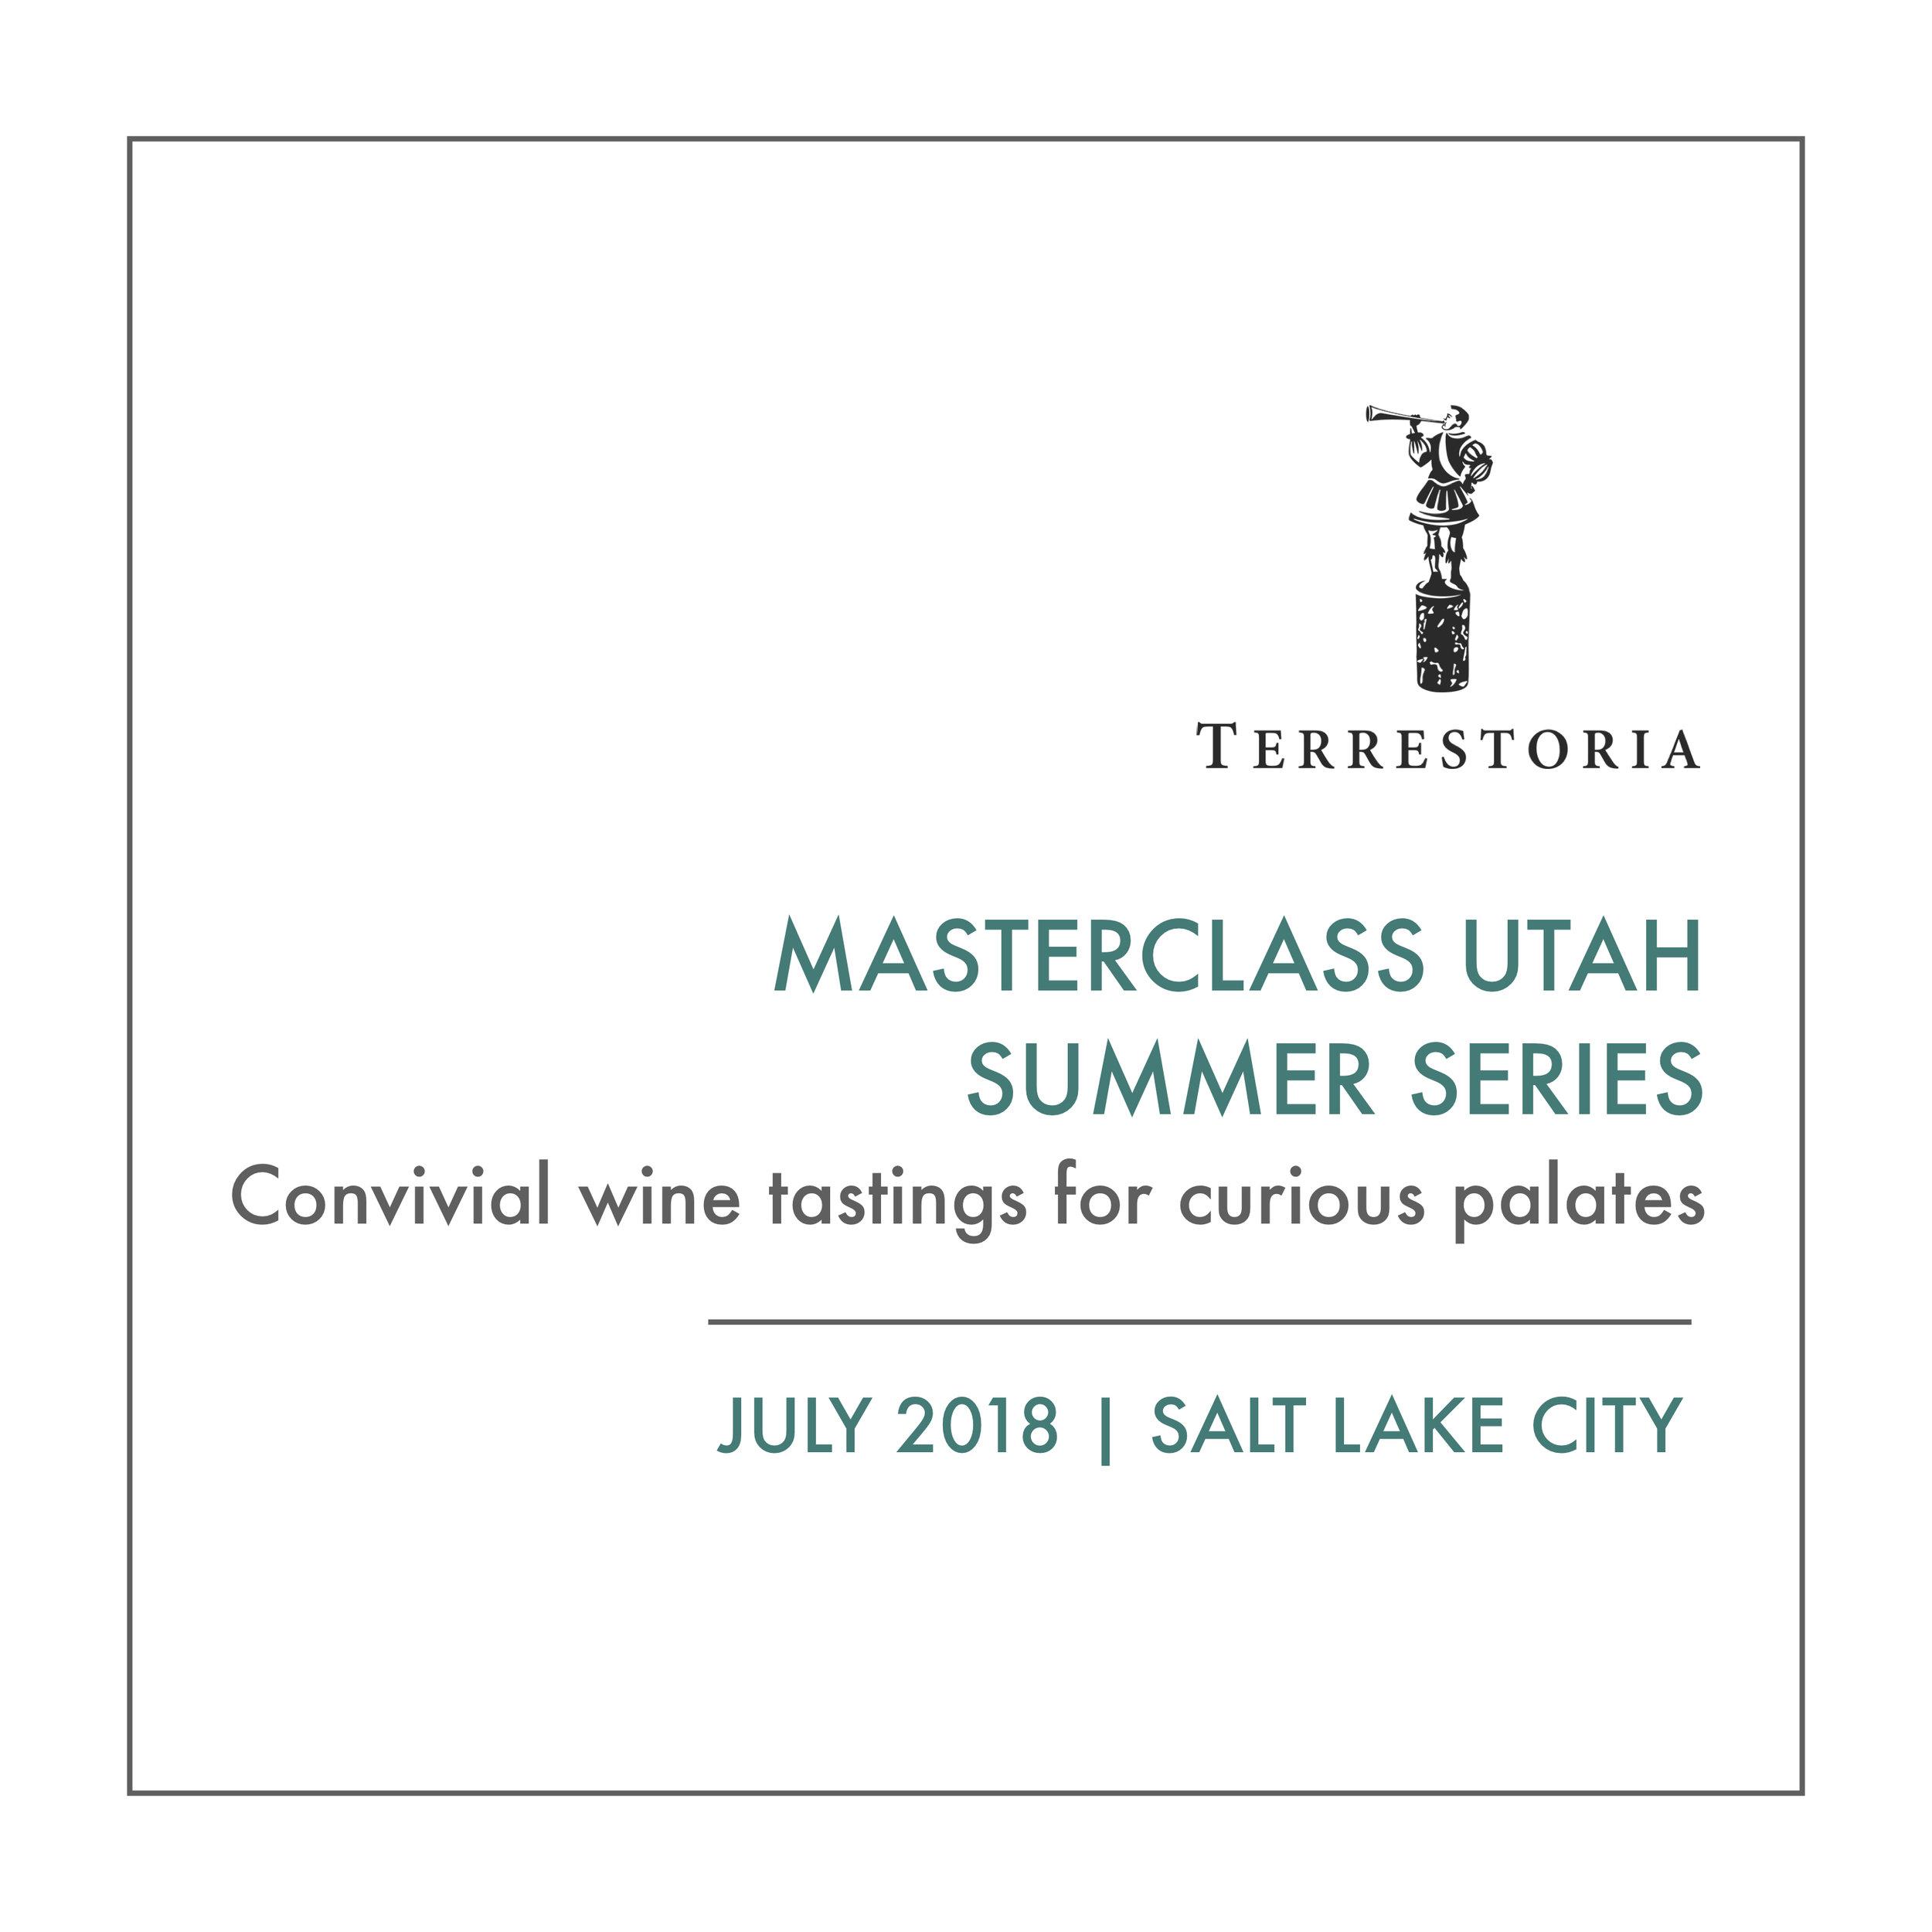 Masterclass Utah 2018 square.jpg